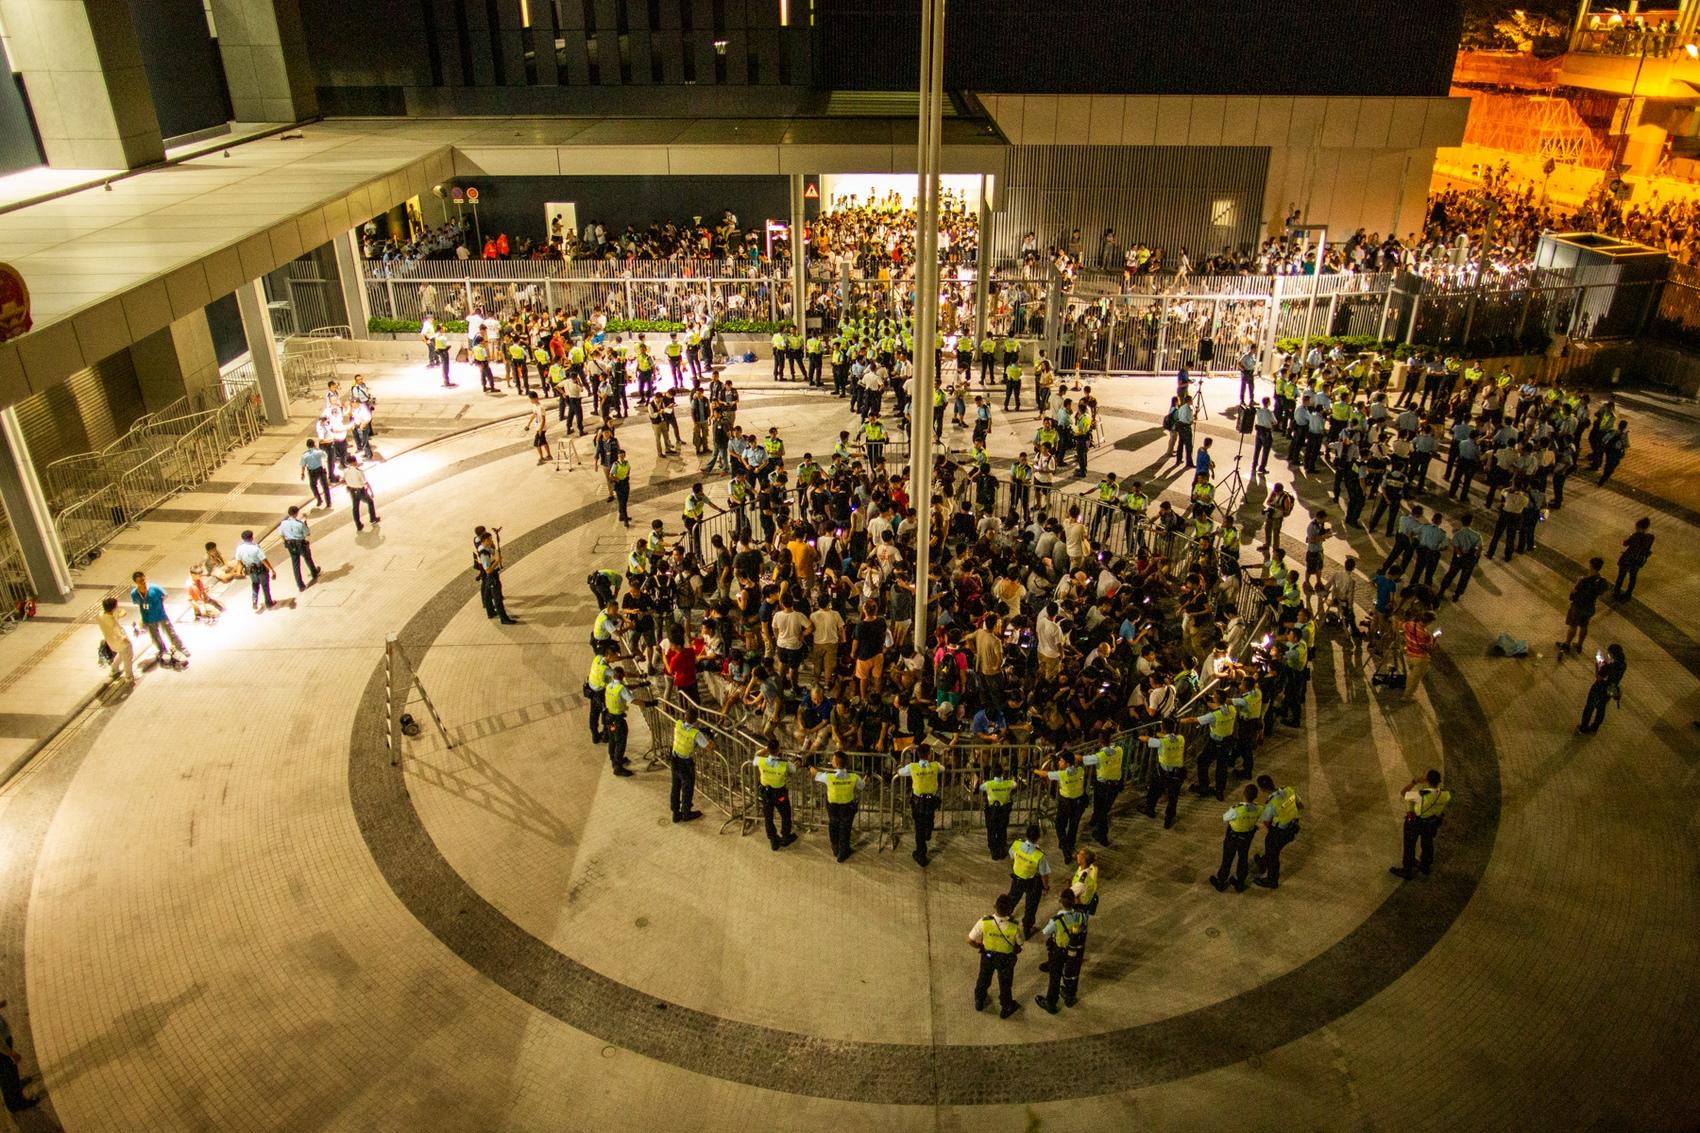 8_todd-r-sayang-dokumenter-fotografer-hong-kong-umbrella-movement-demokrasi-protes-hak asasi manusia